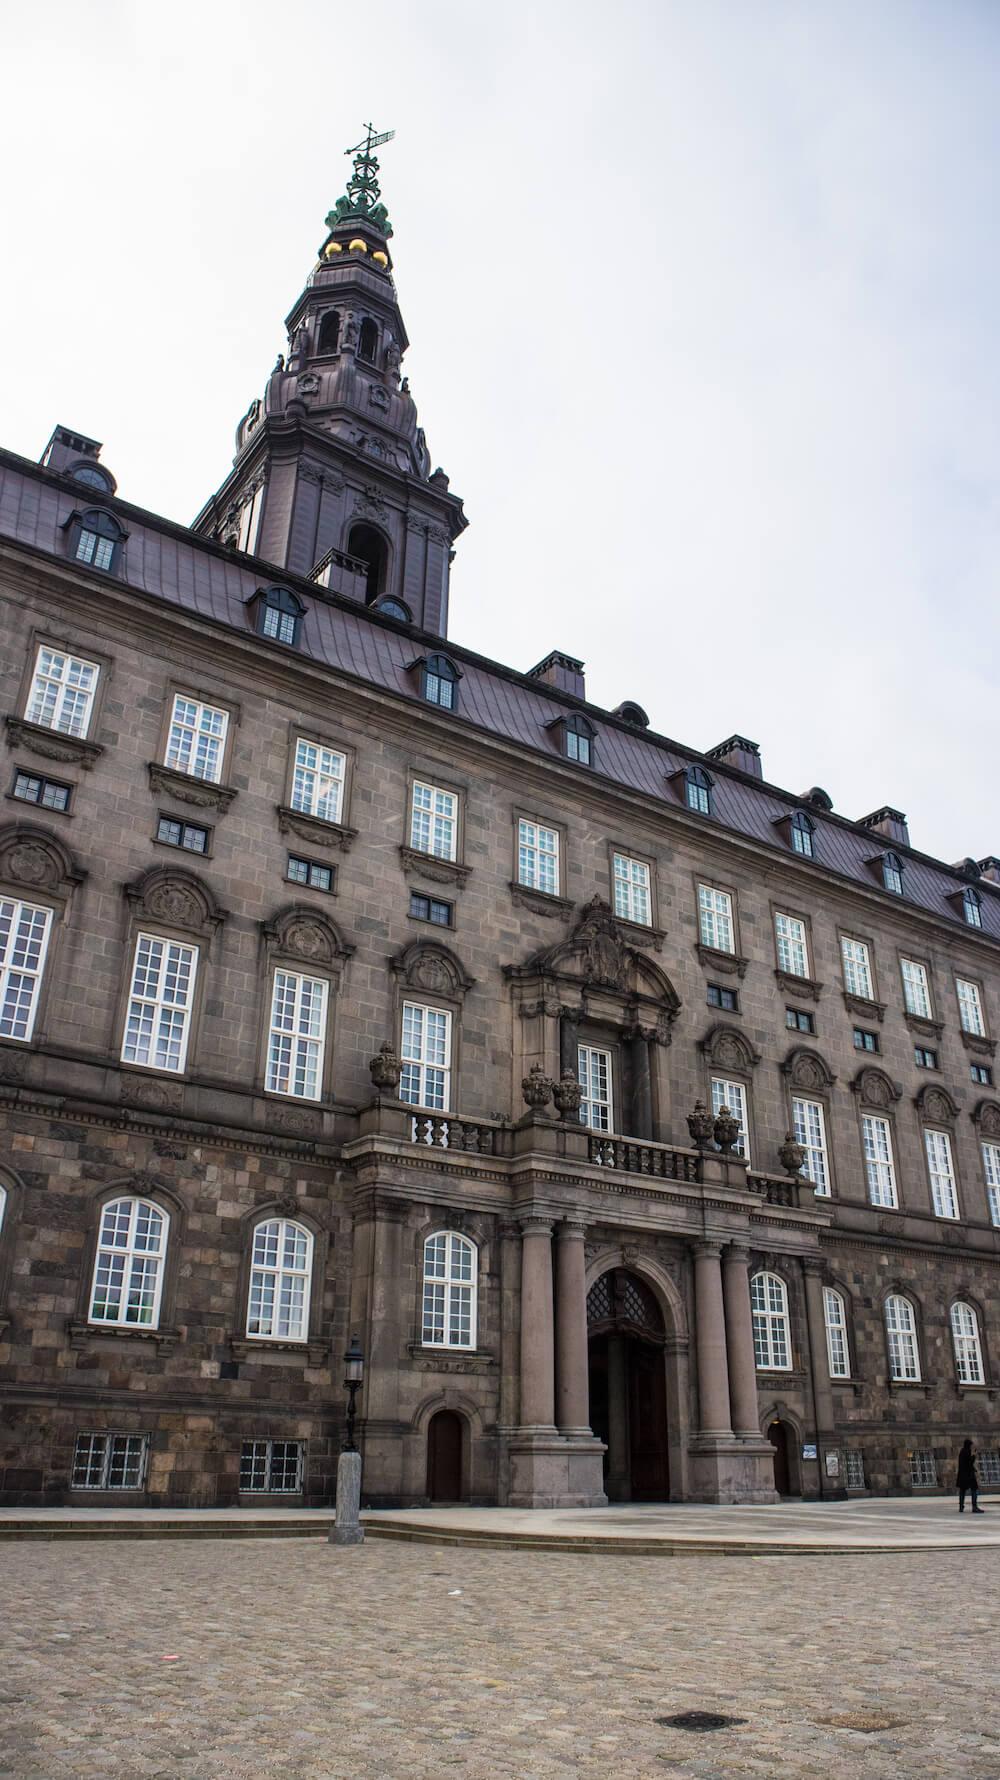 uitzicht christianborg slot kopenhagen winter